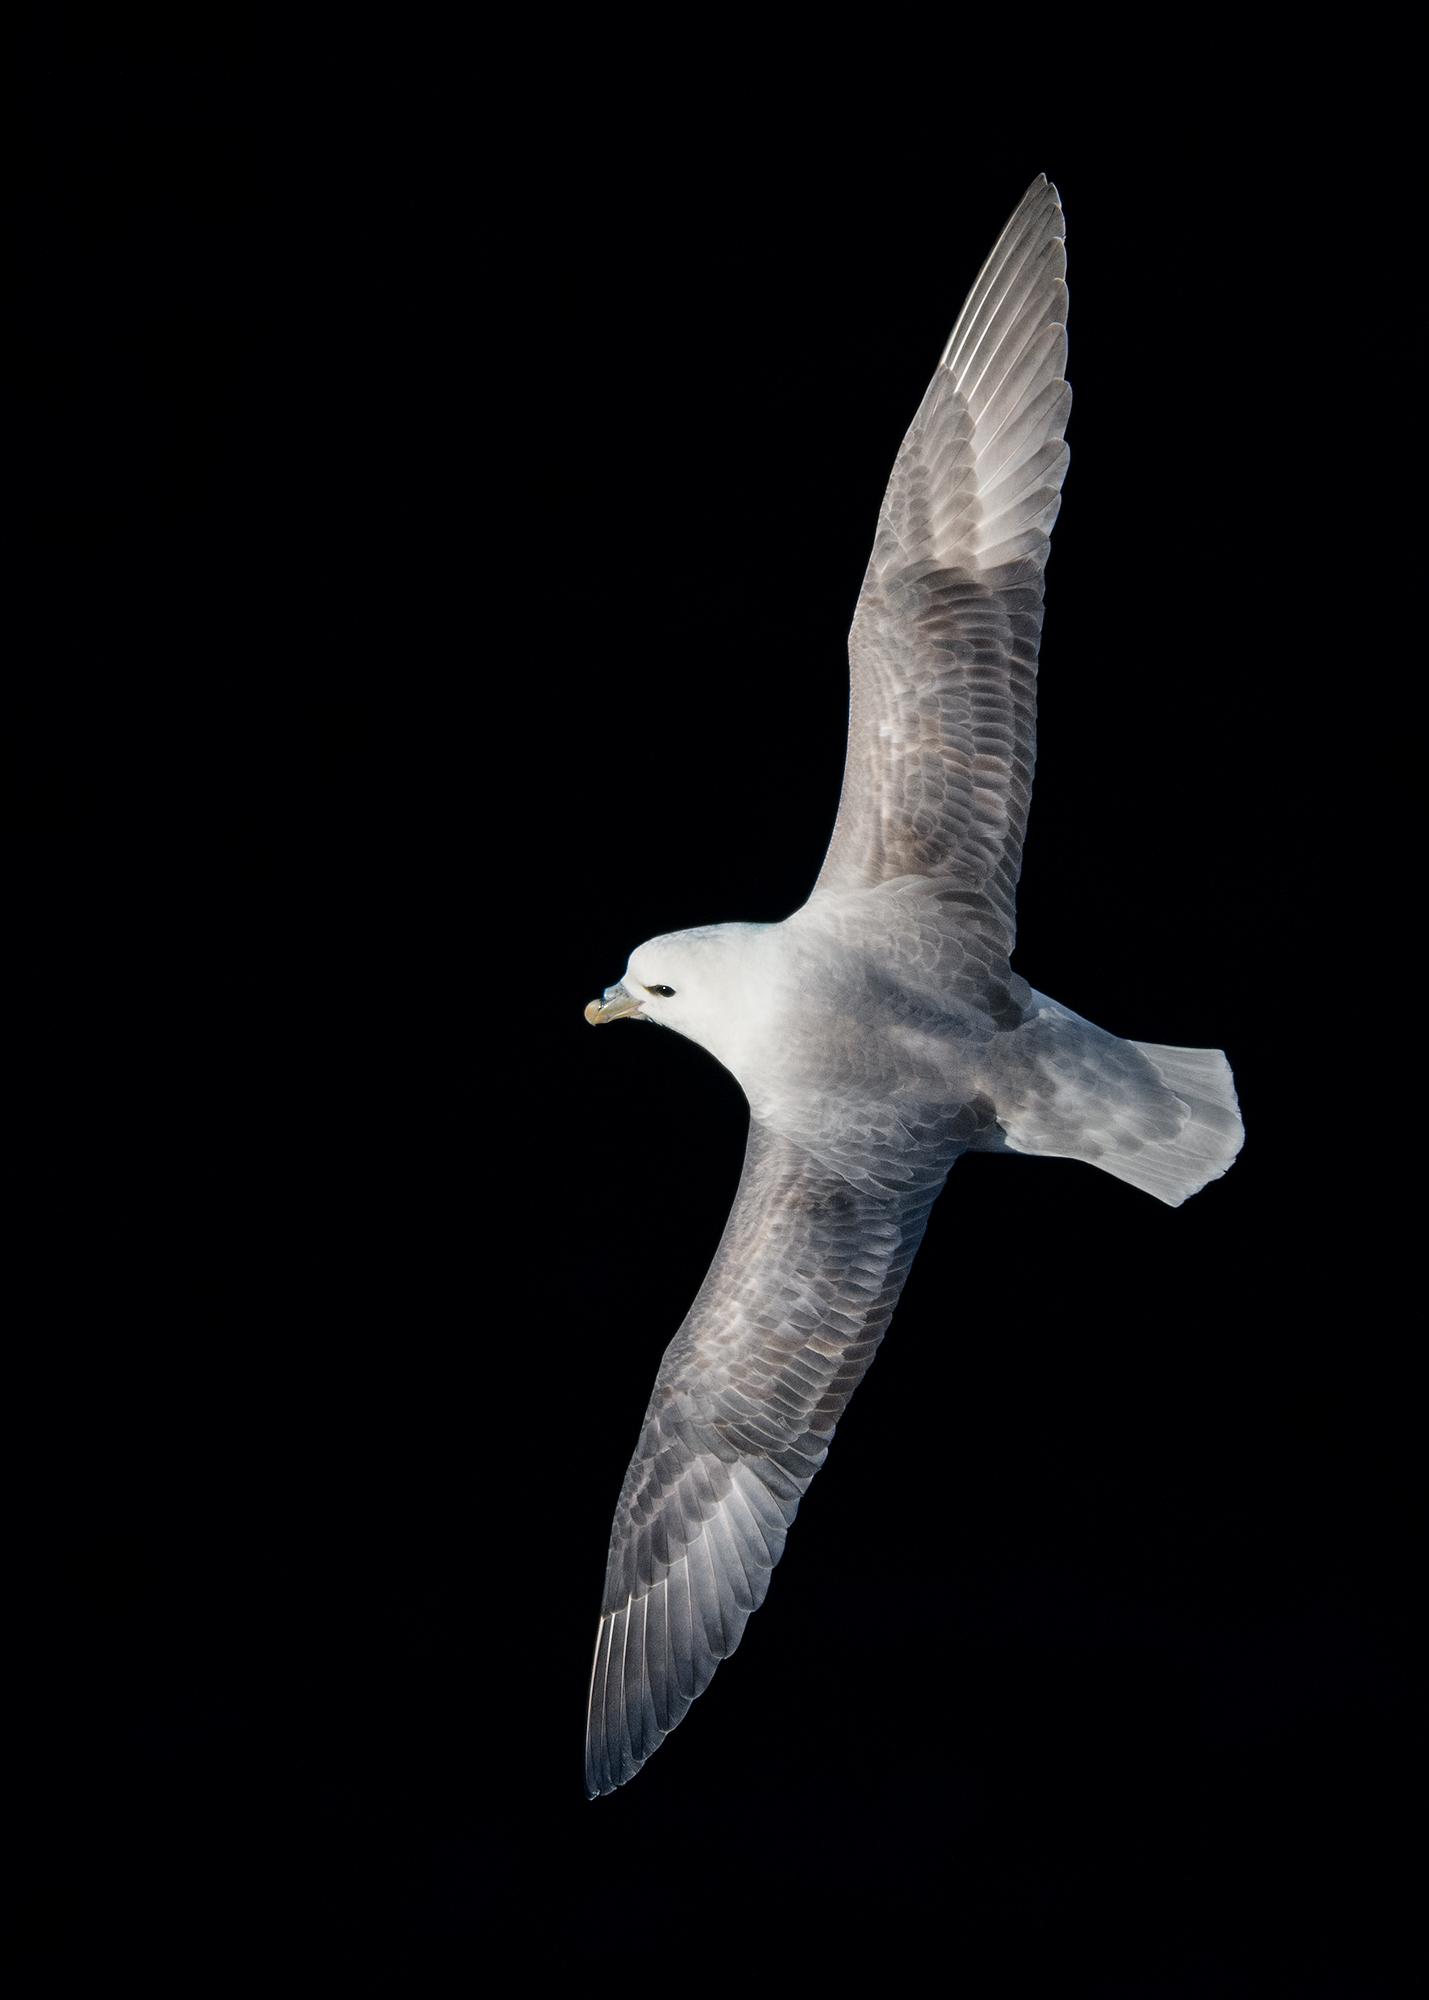 Stormfågel JPEG_web 6.jpg